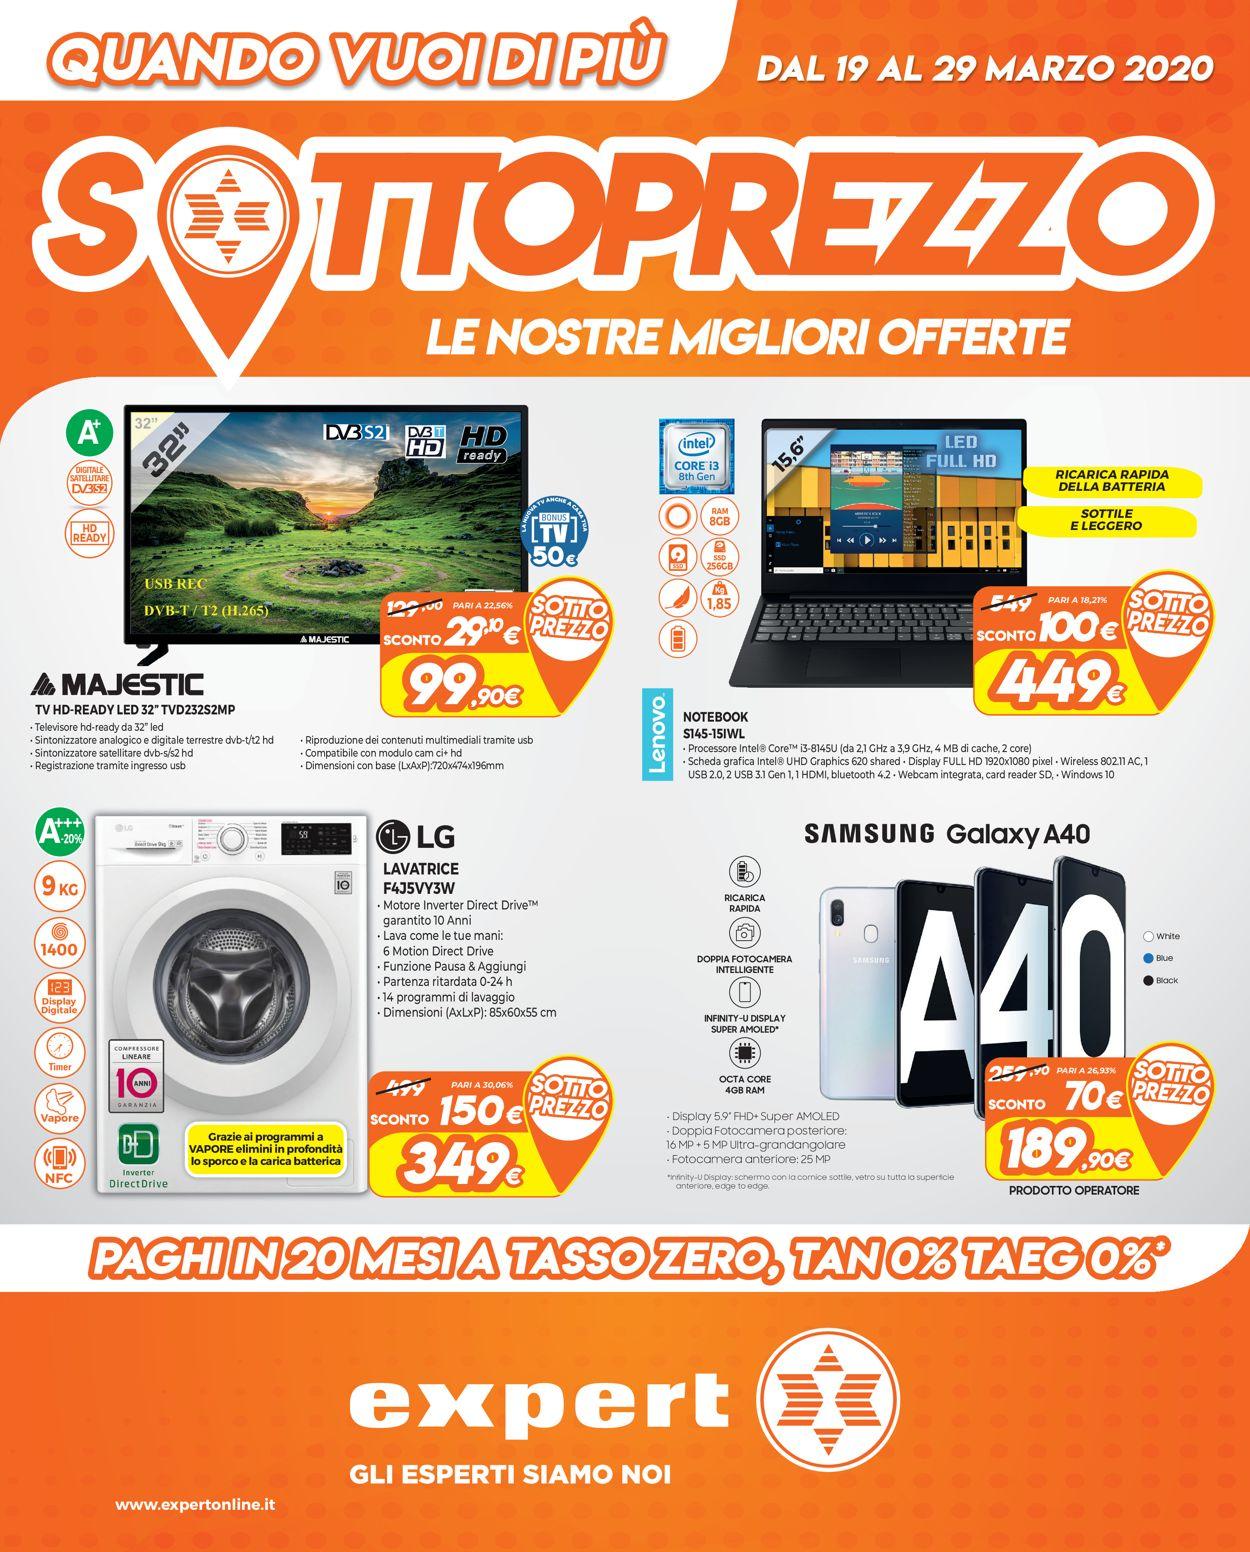 Volantino Iperal - Offerte 19/03-29/03/2020